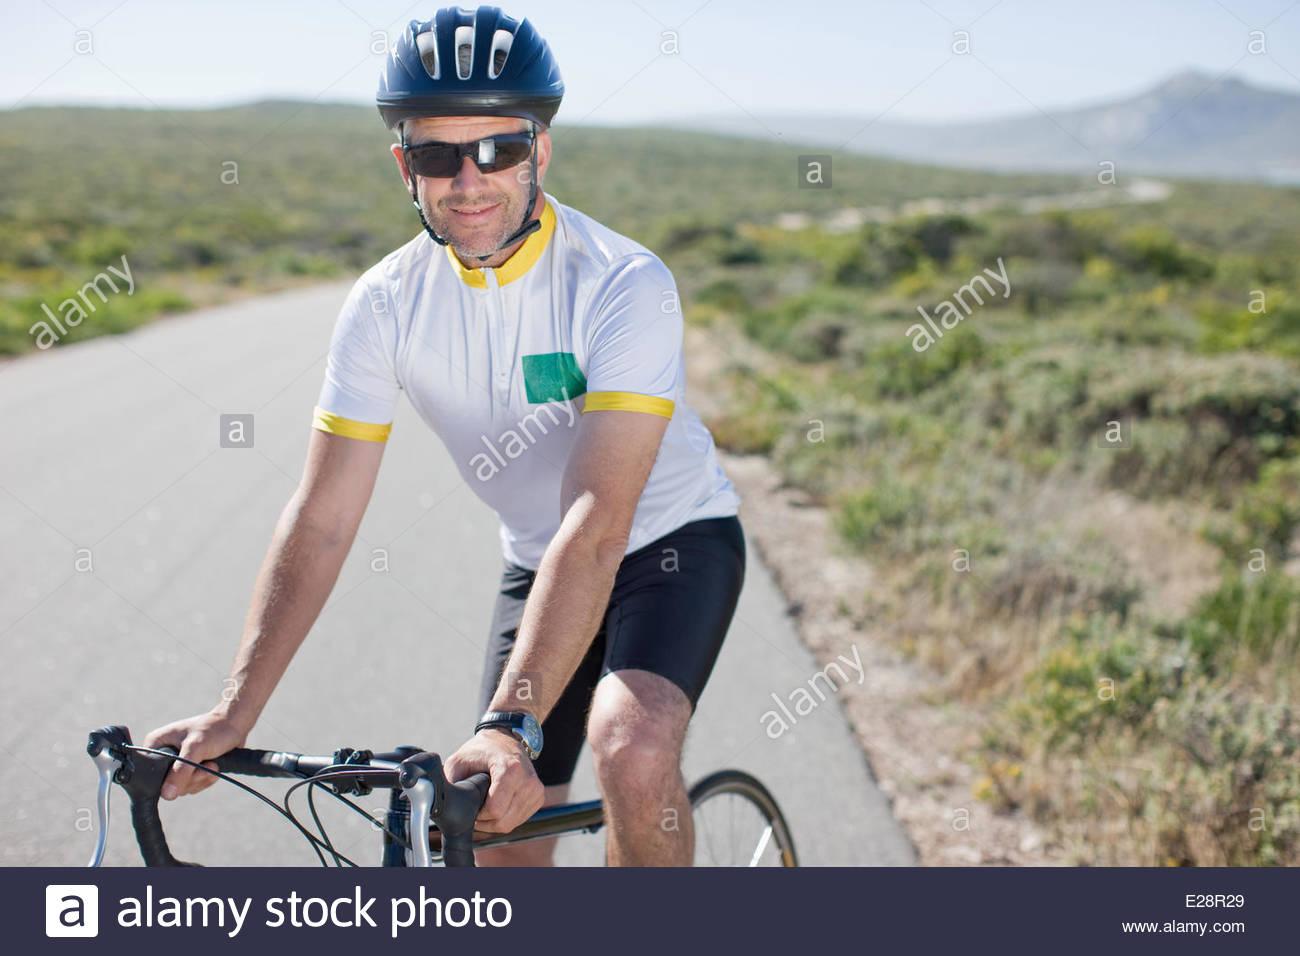 Man in helmet sitting on bicycle - Stock Image